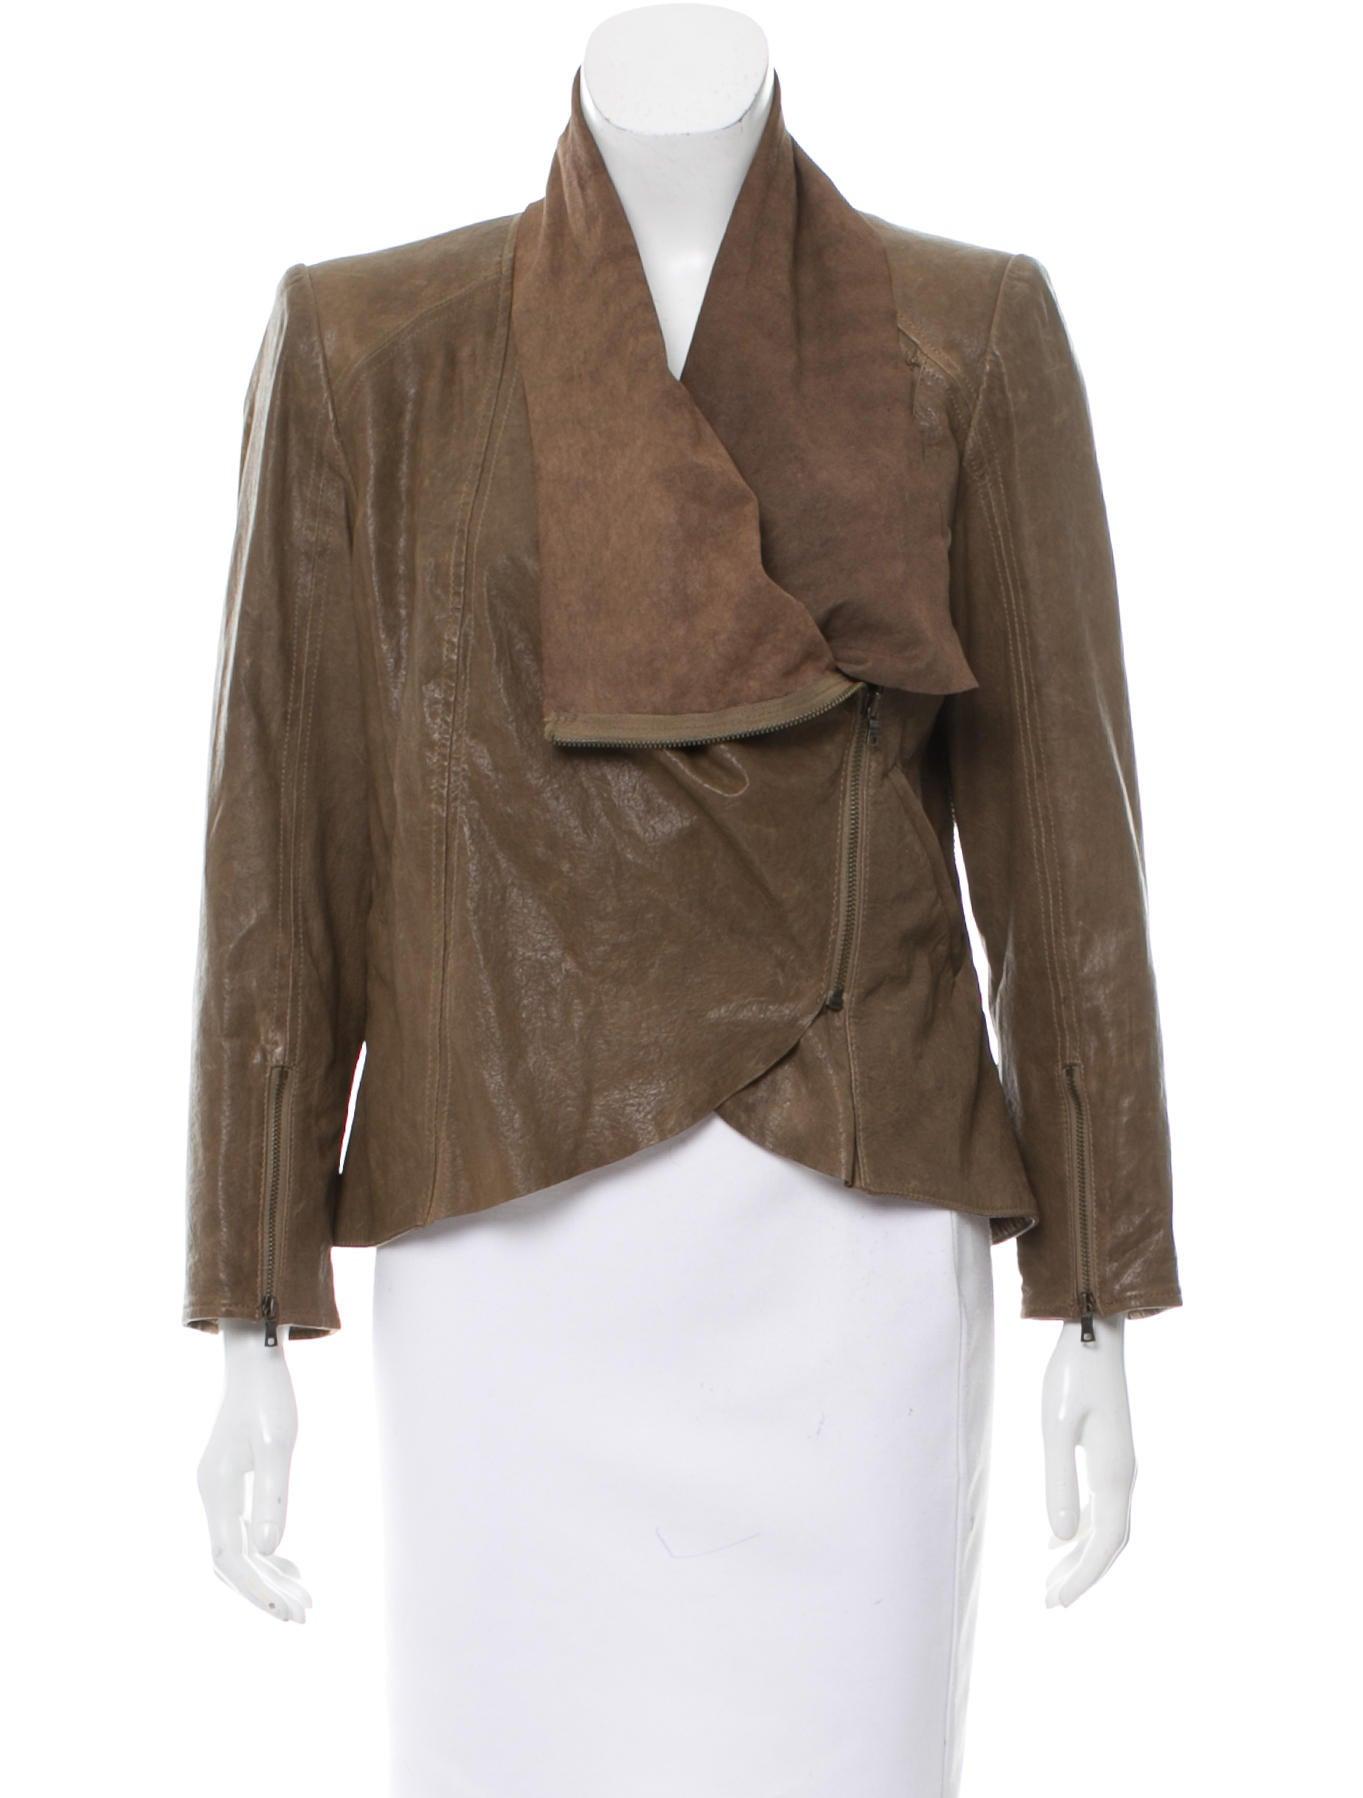 Alice olivia leather jacket